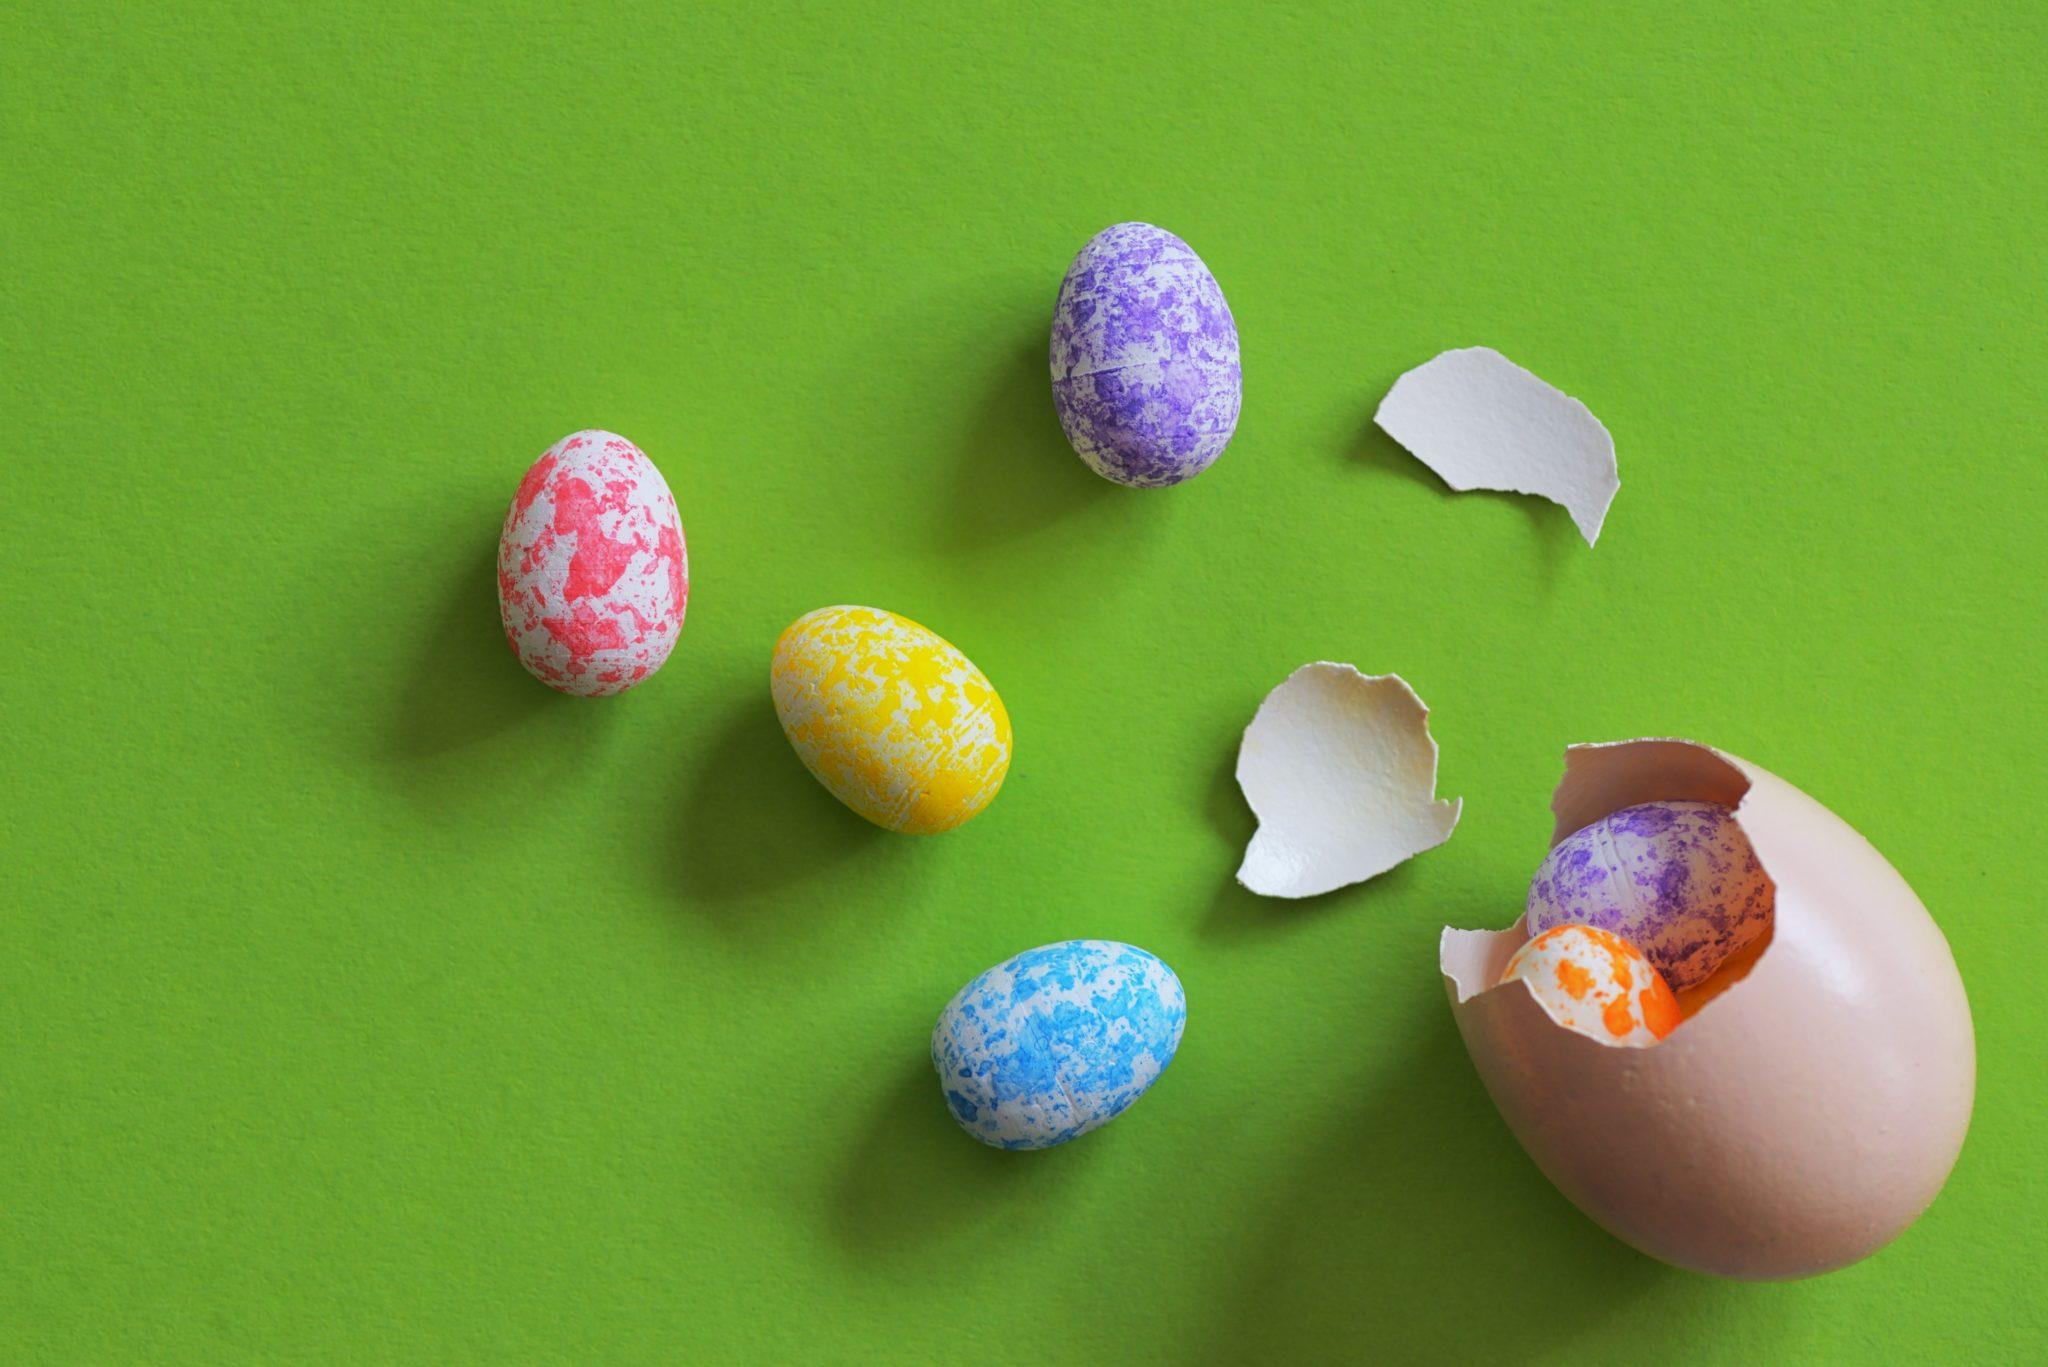 perché a pasqua mangiamo uova?